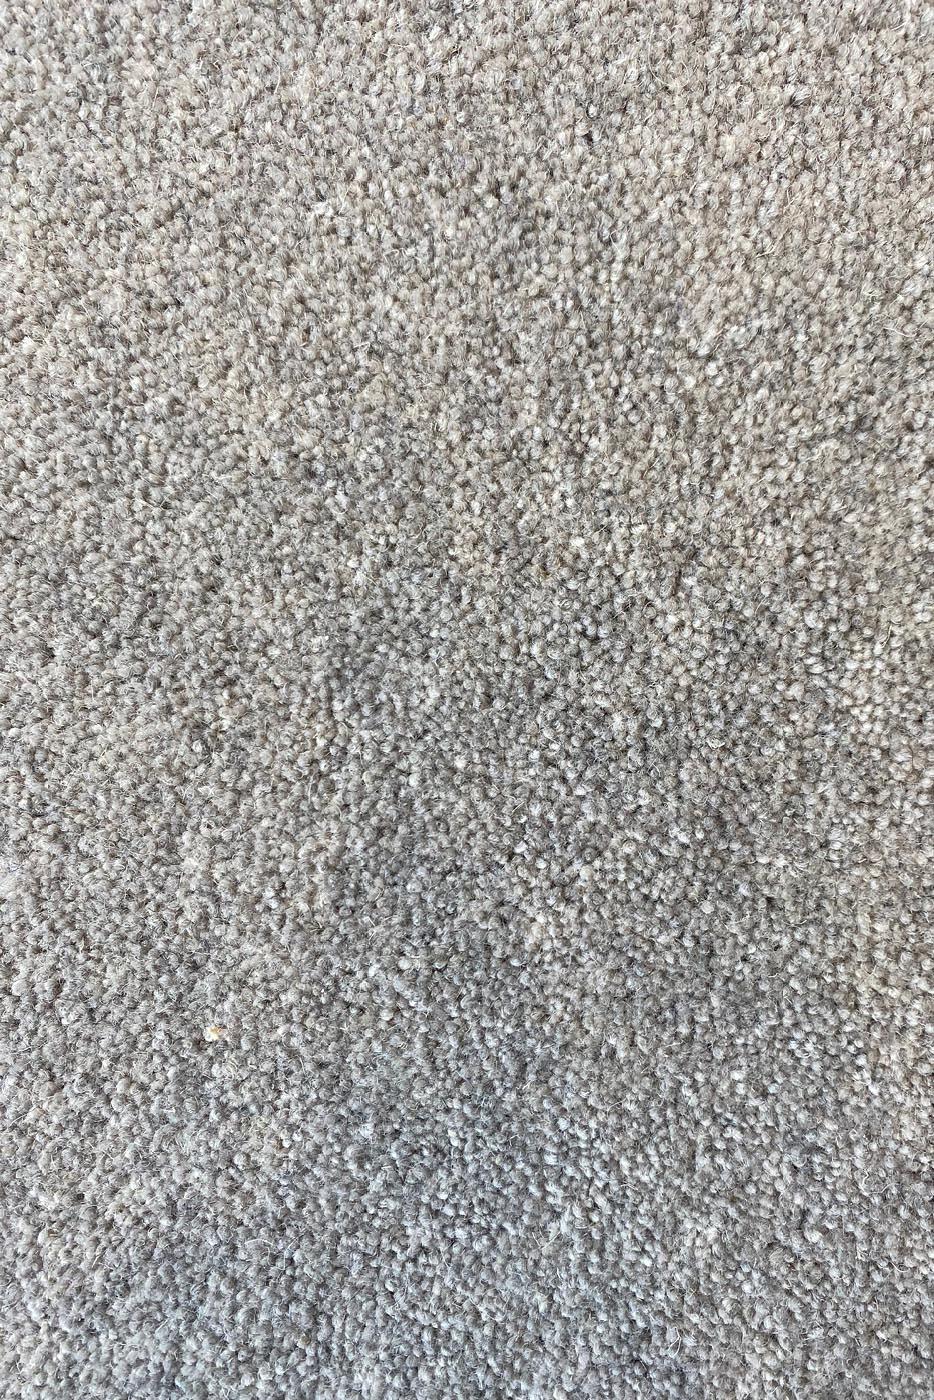 Carpet - Moquette Dinard by Pinton